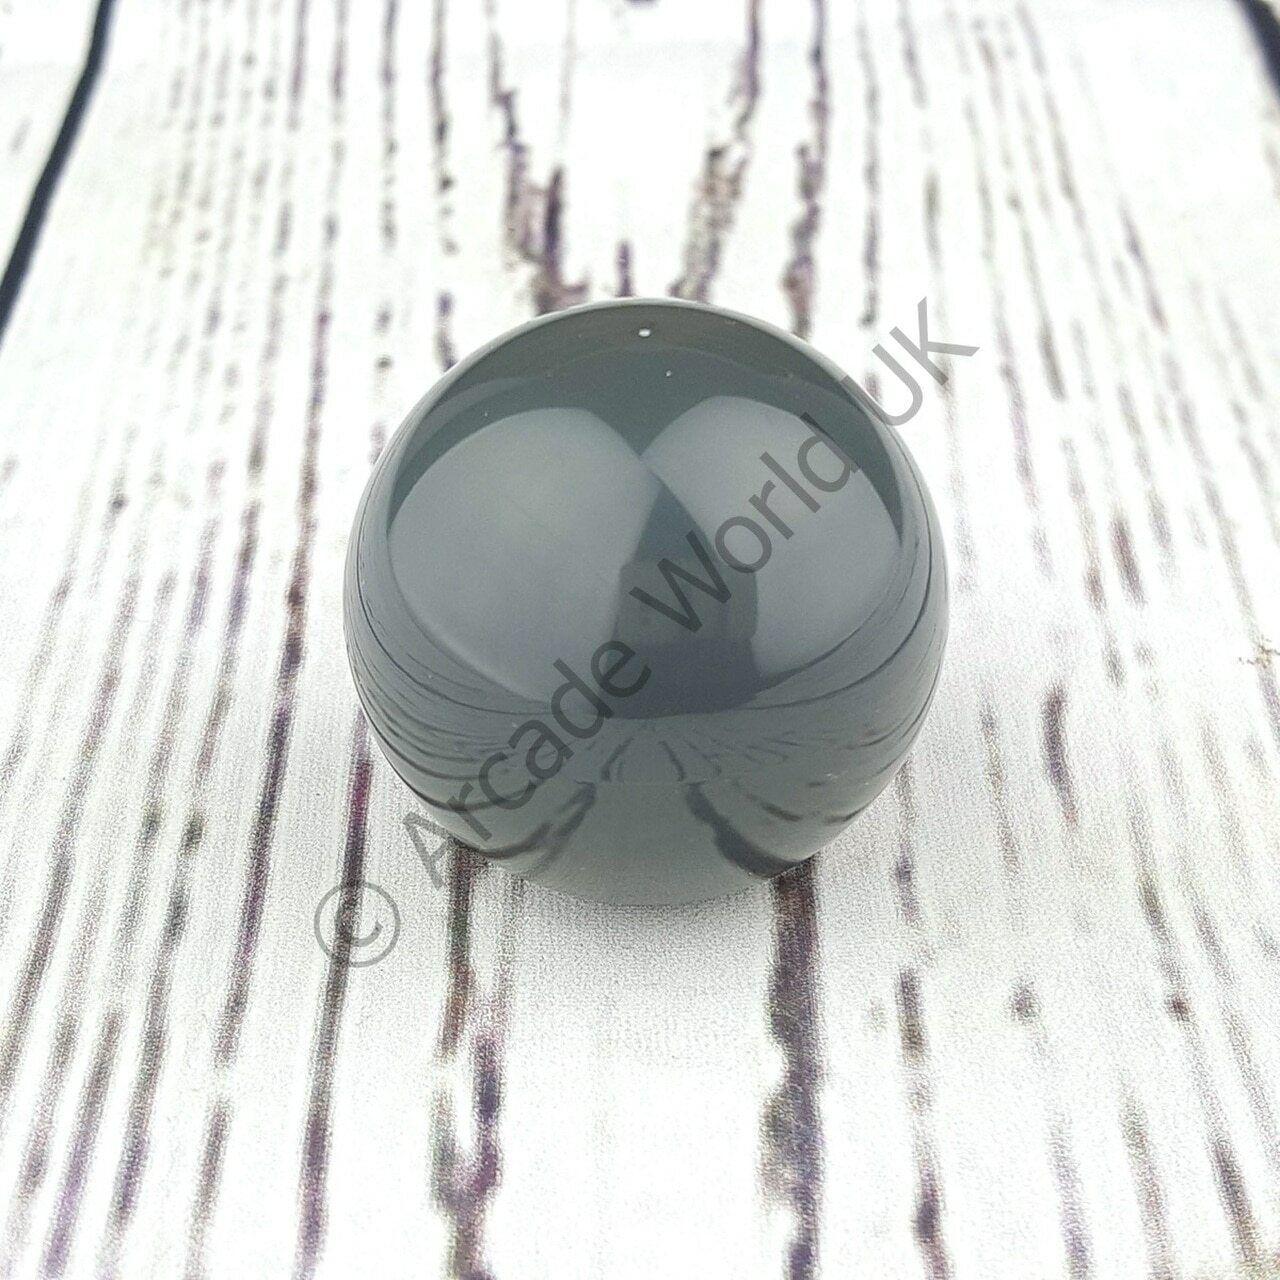 Genuine 35mm Sanwa LB-35 Ball Top Handle For Arcade Joysticks - Choose Colour